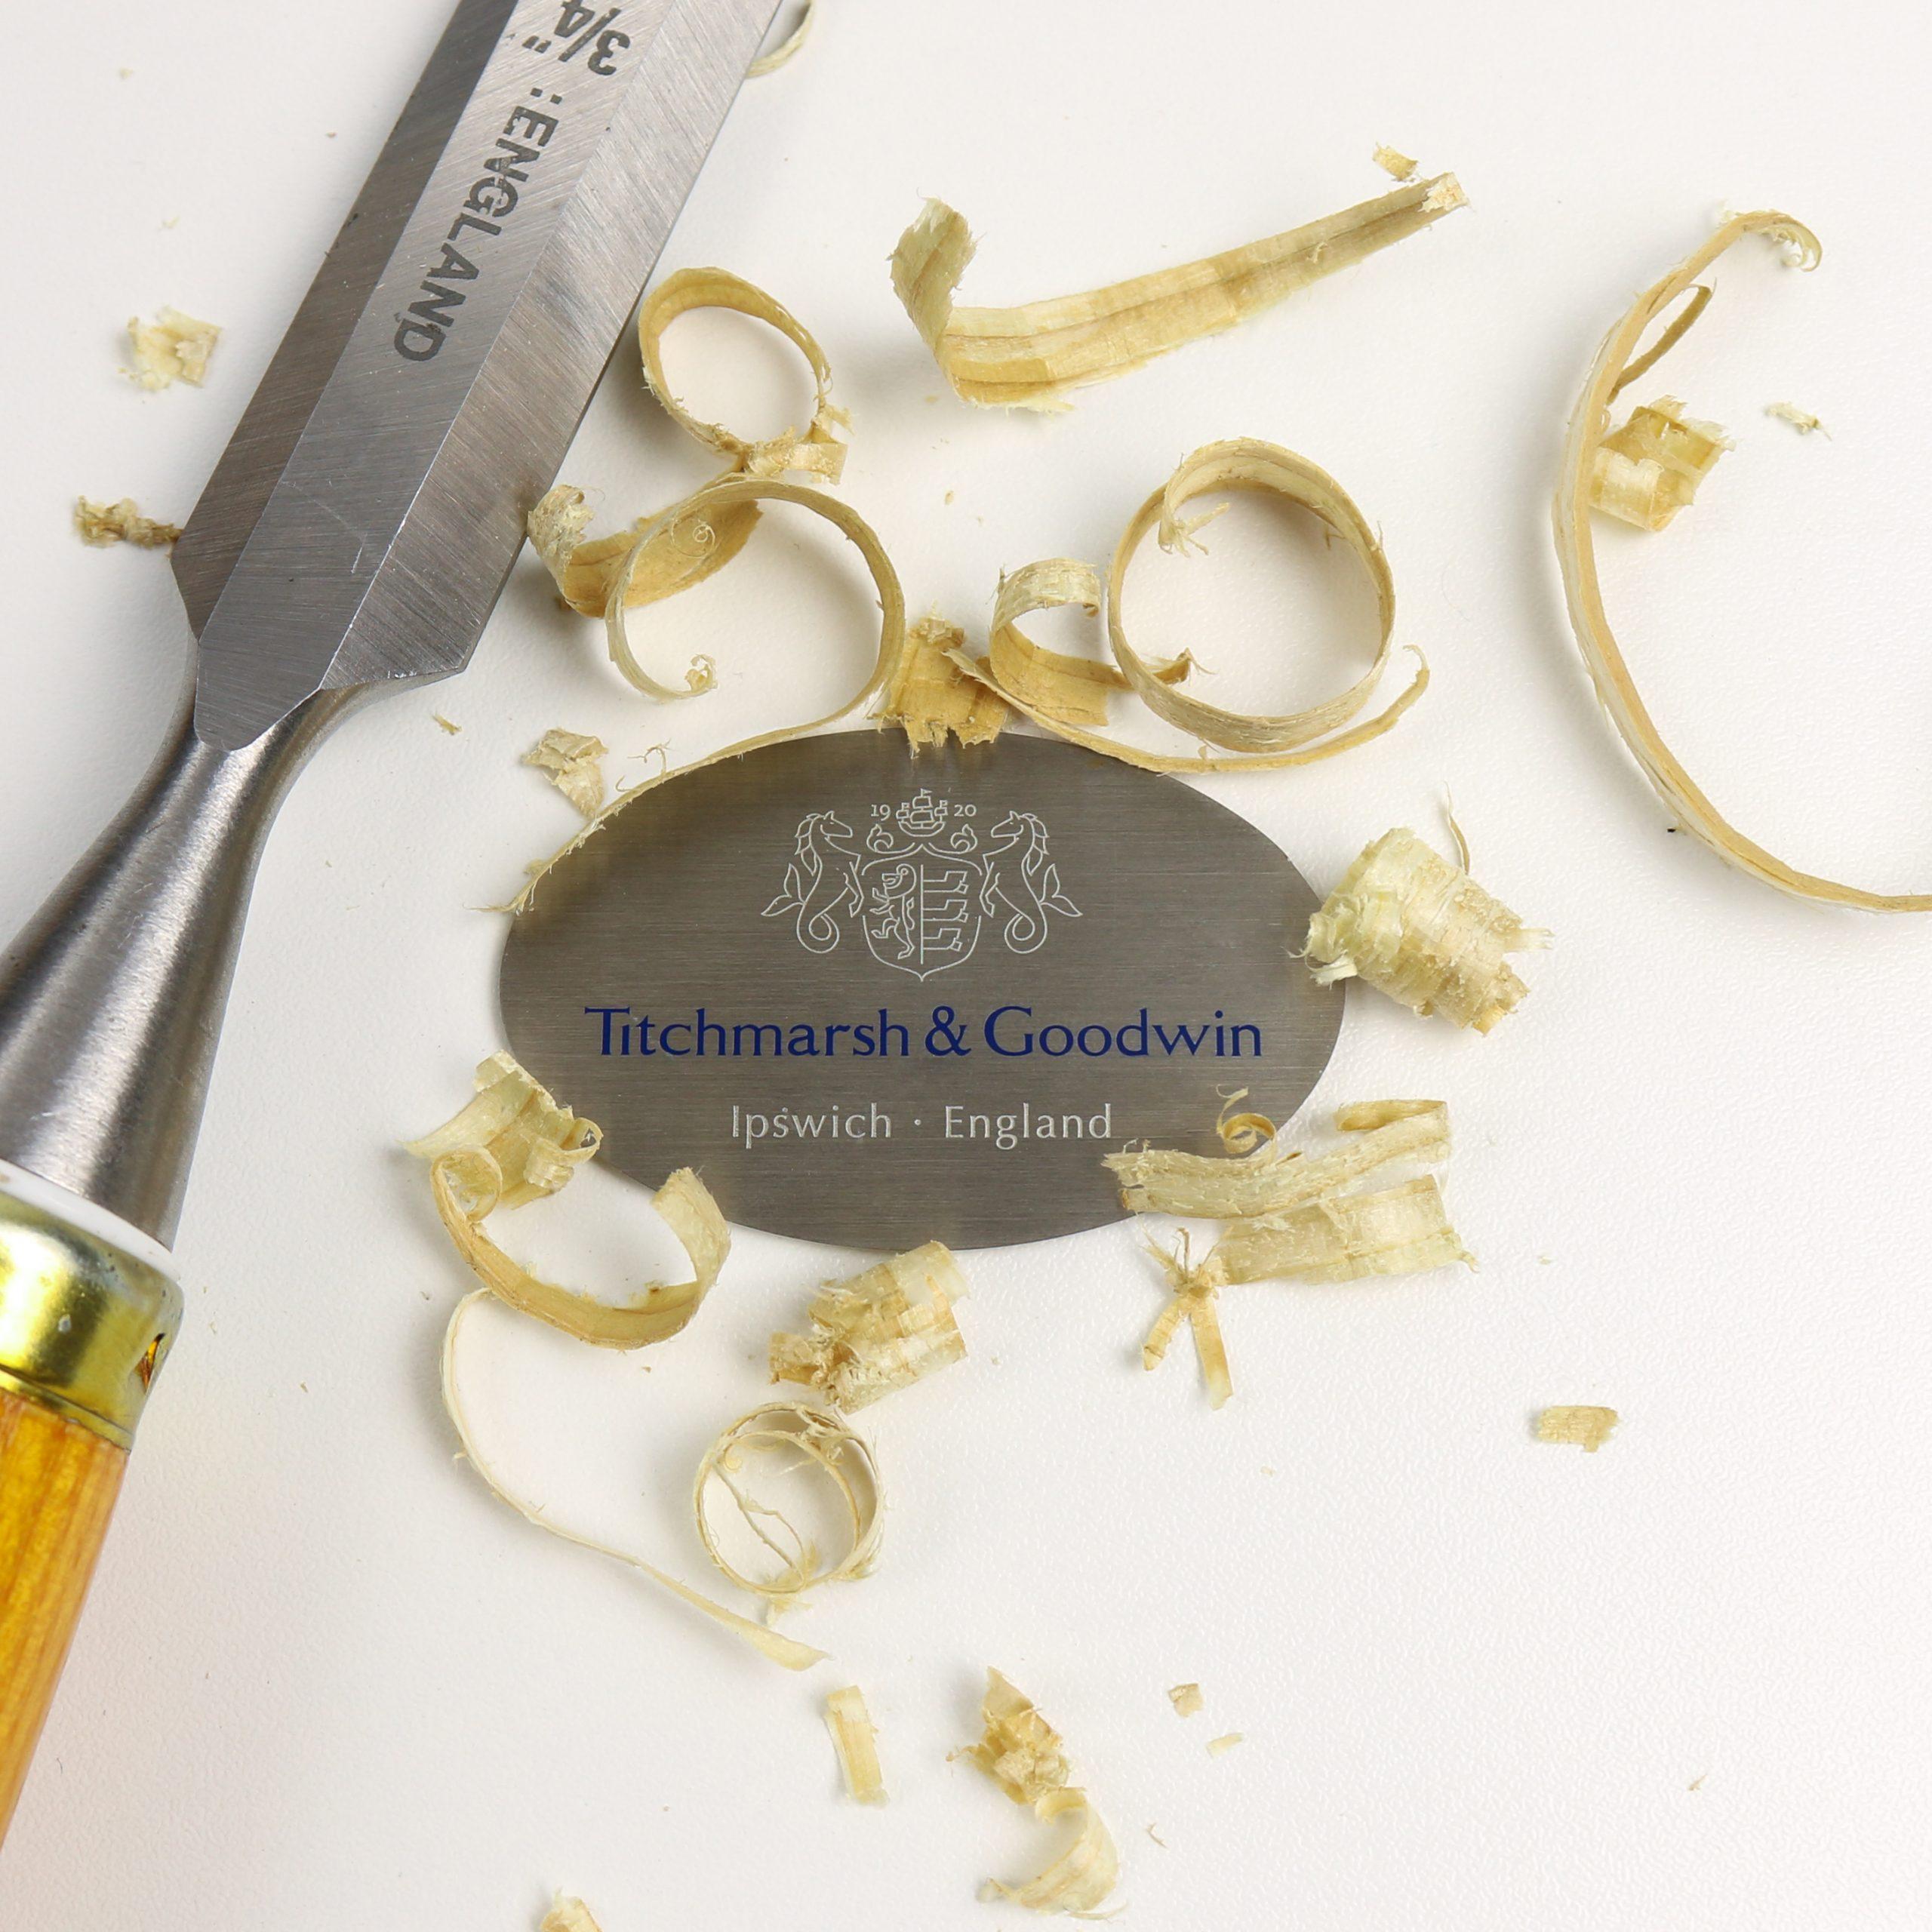 Titchmarsh and Goodwin Bespoke Metal Badge